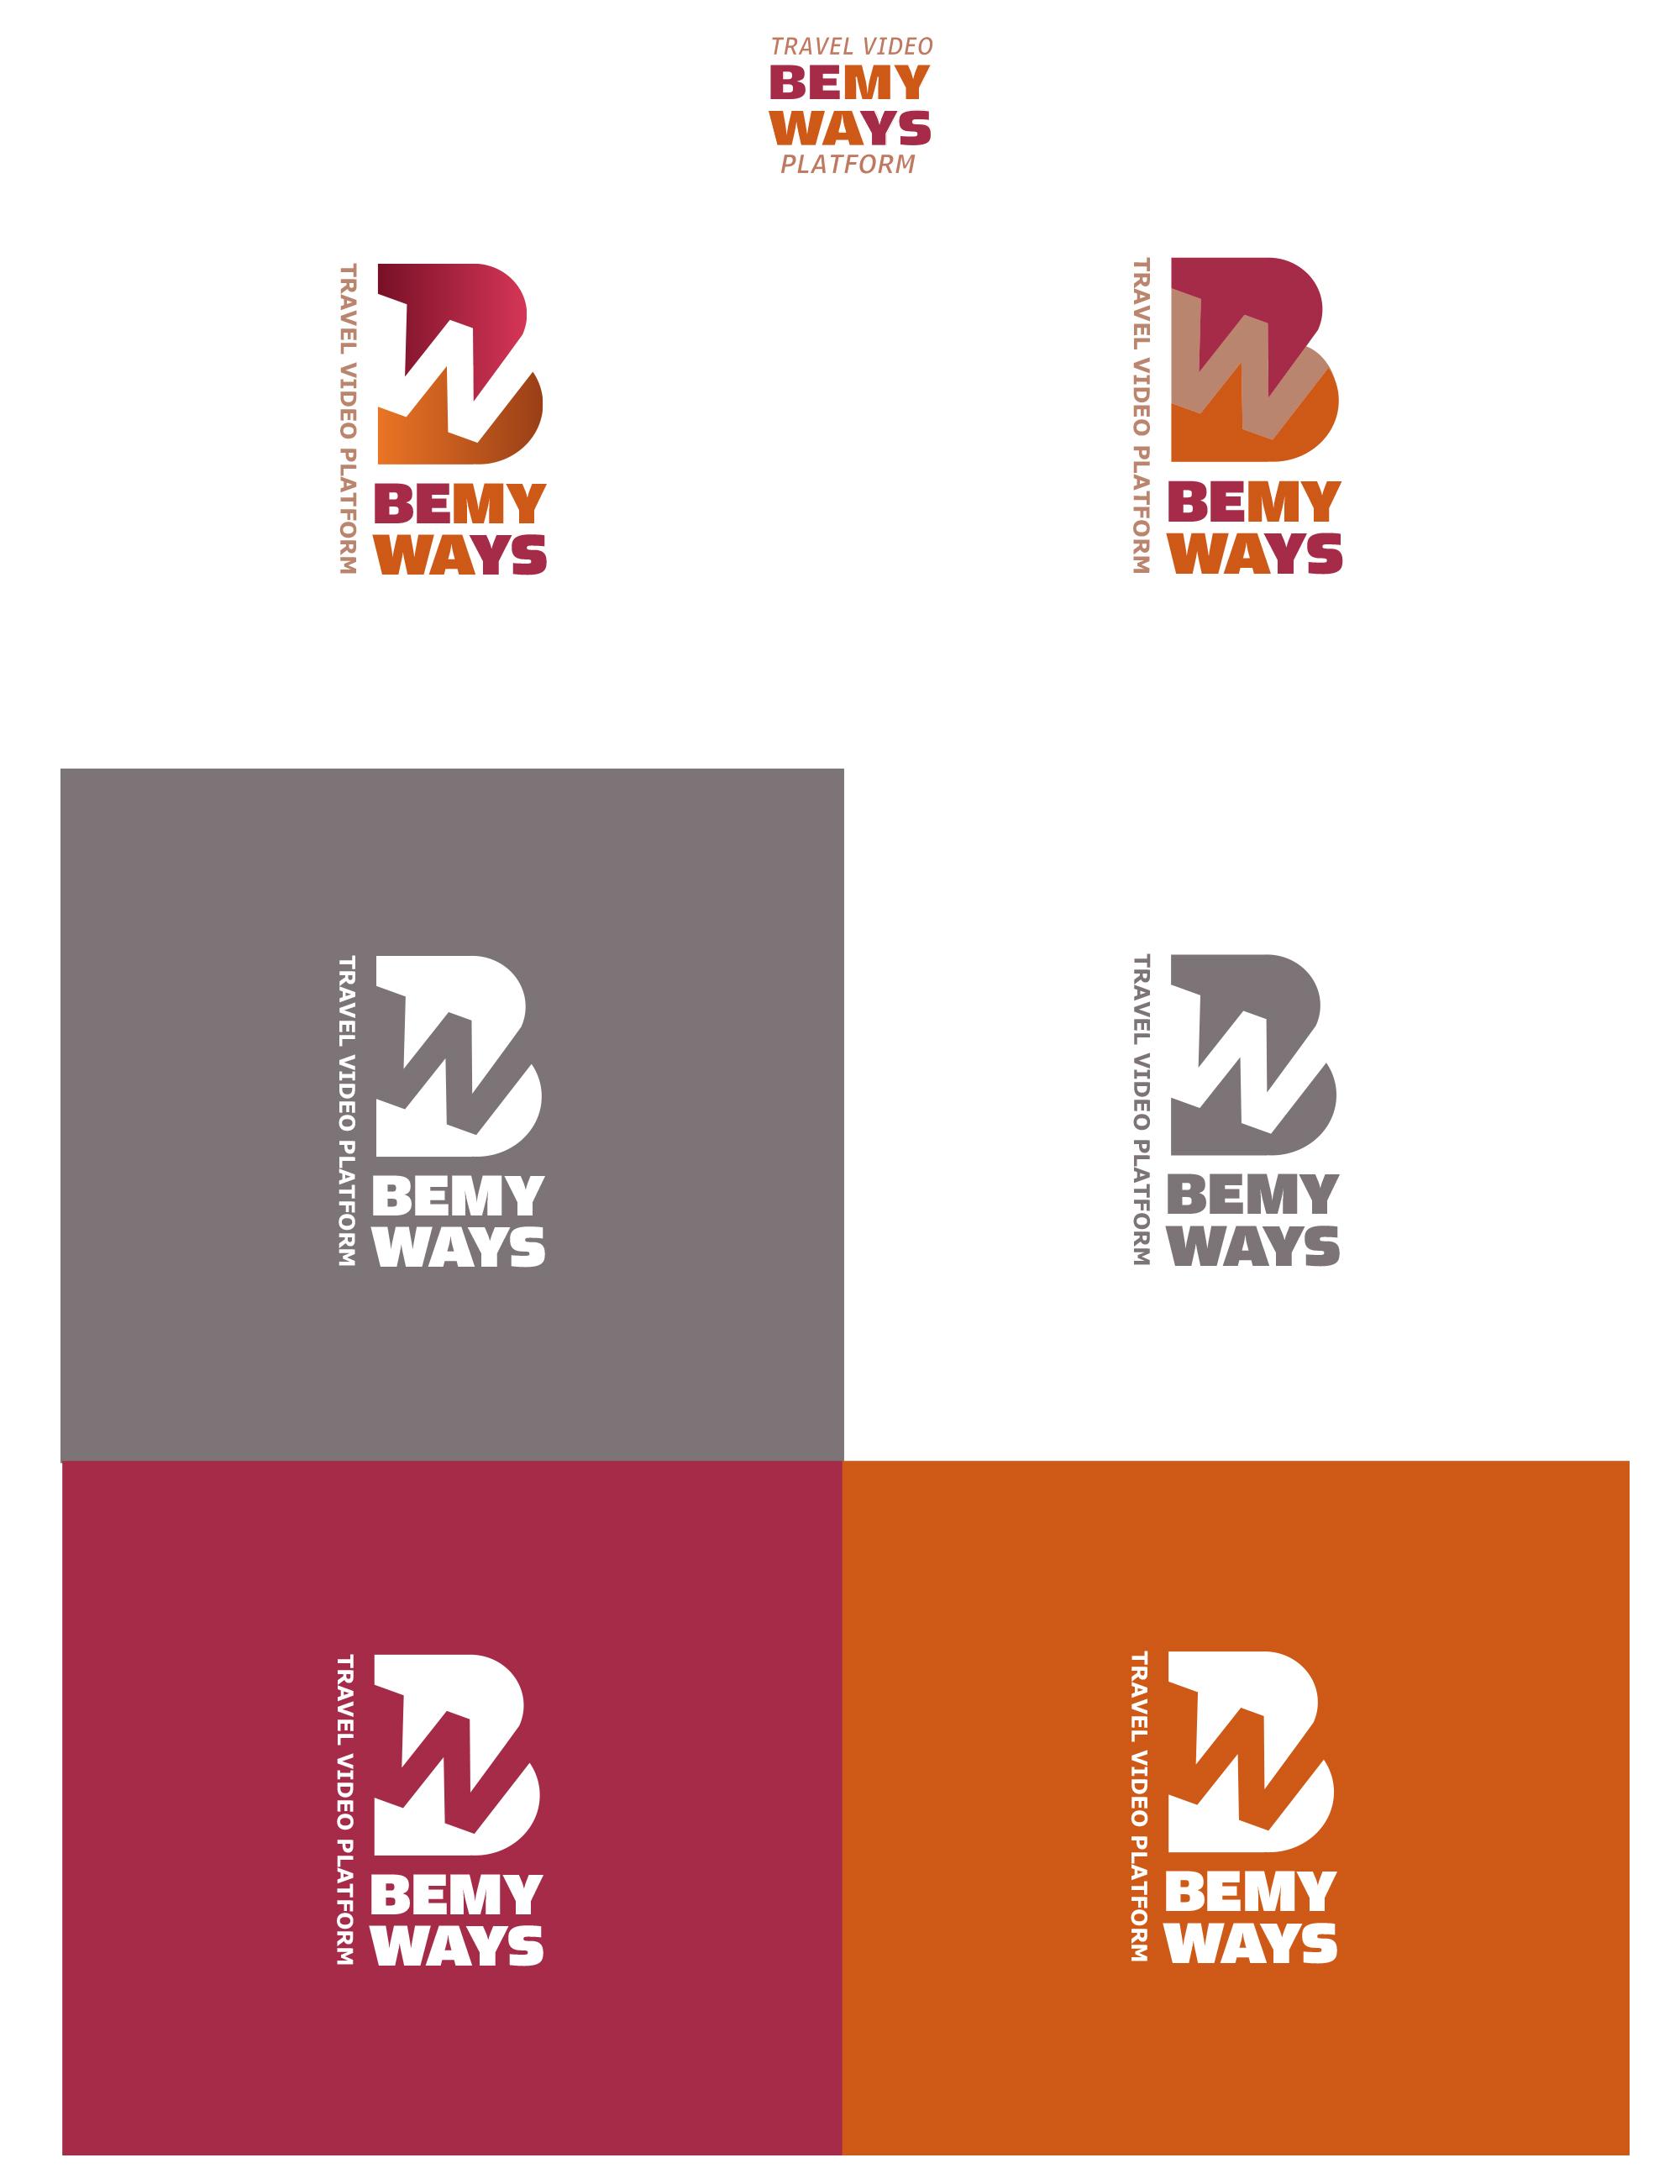 Разработка логотипа и иконки для Travel Video Platform фото f_9525c36708840a4b.jpg